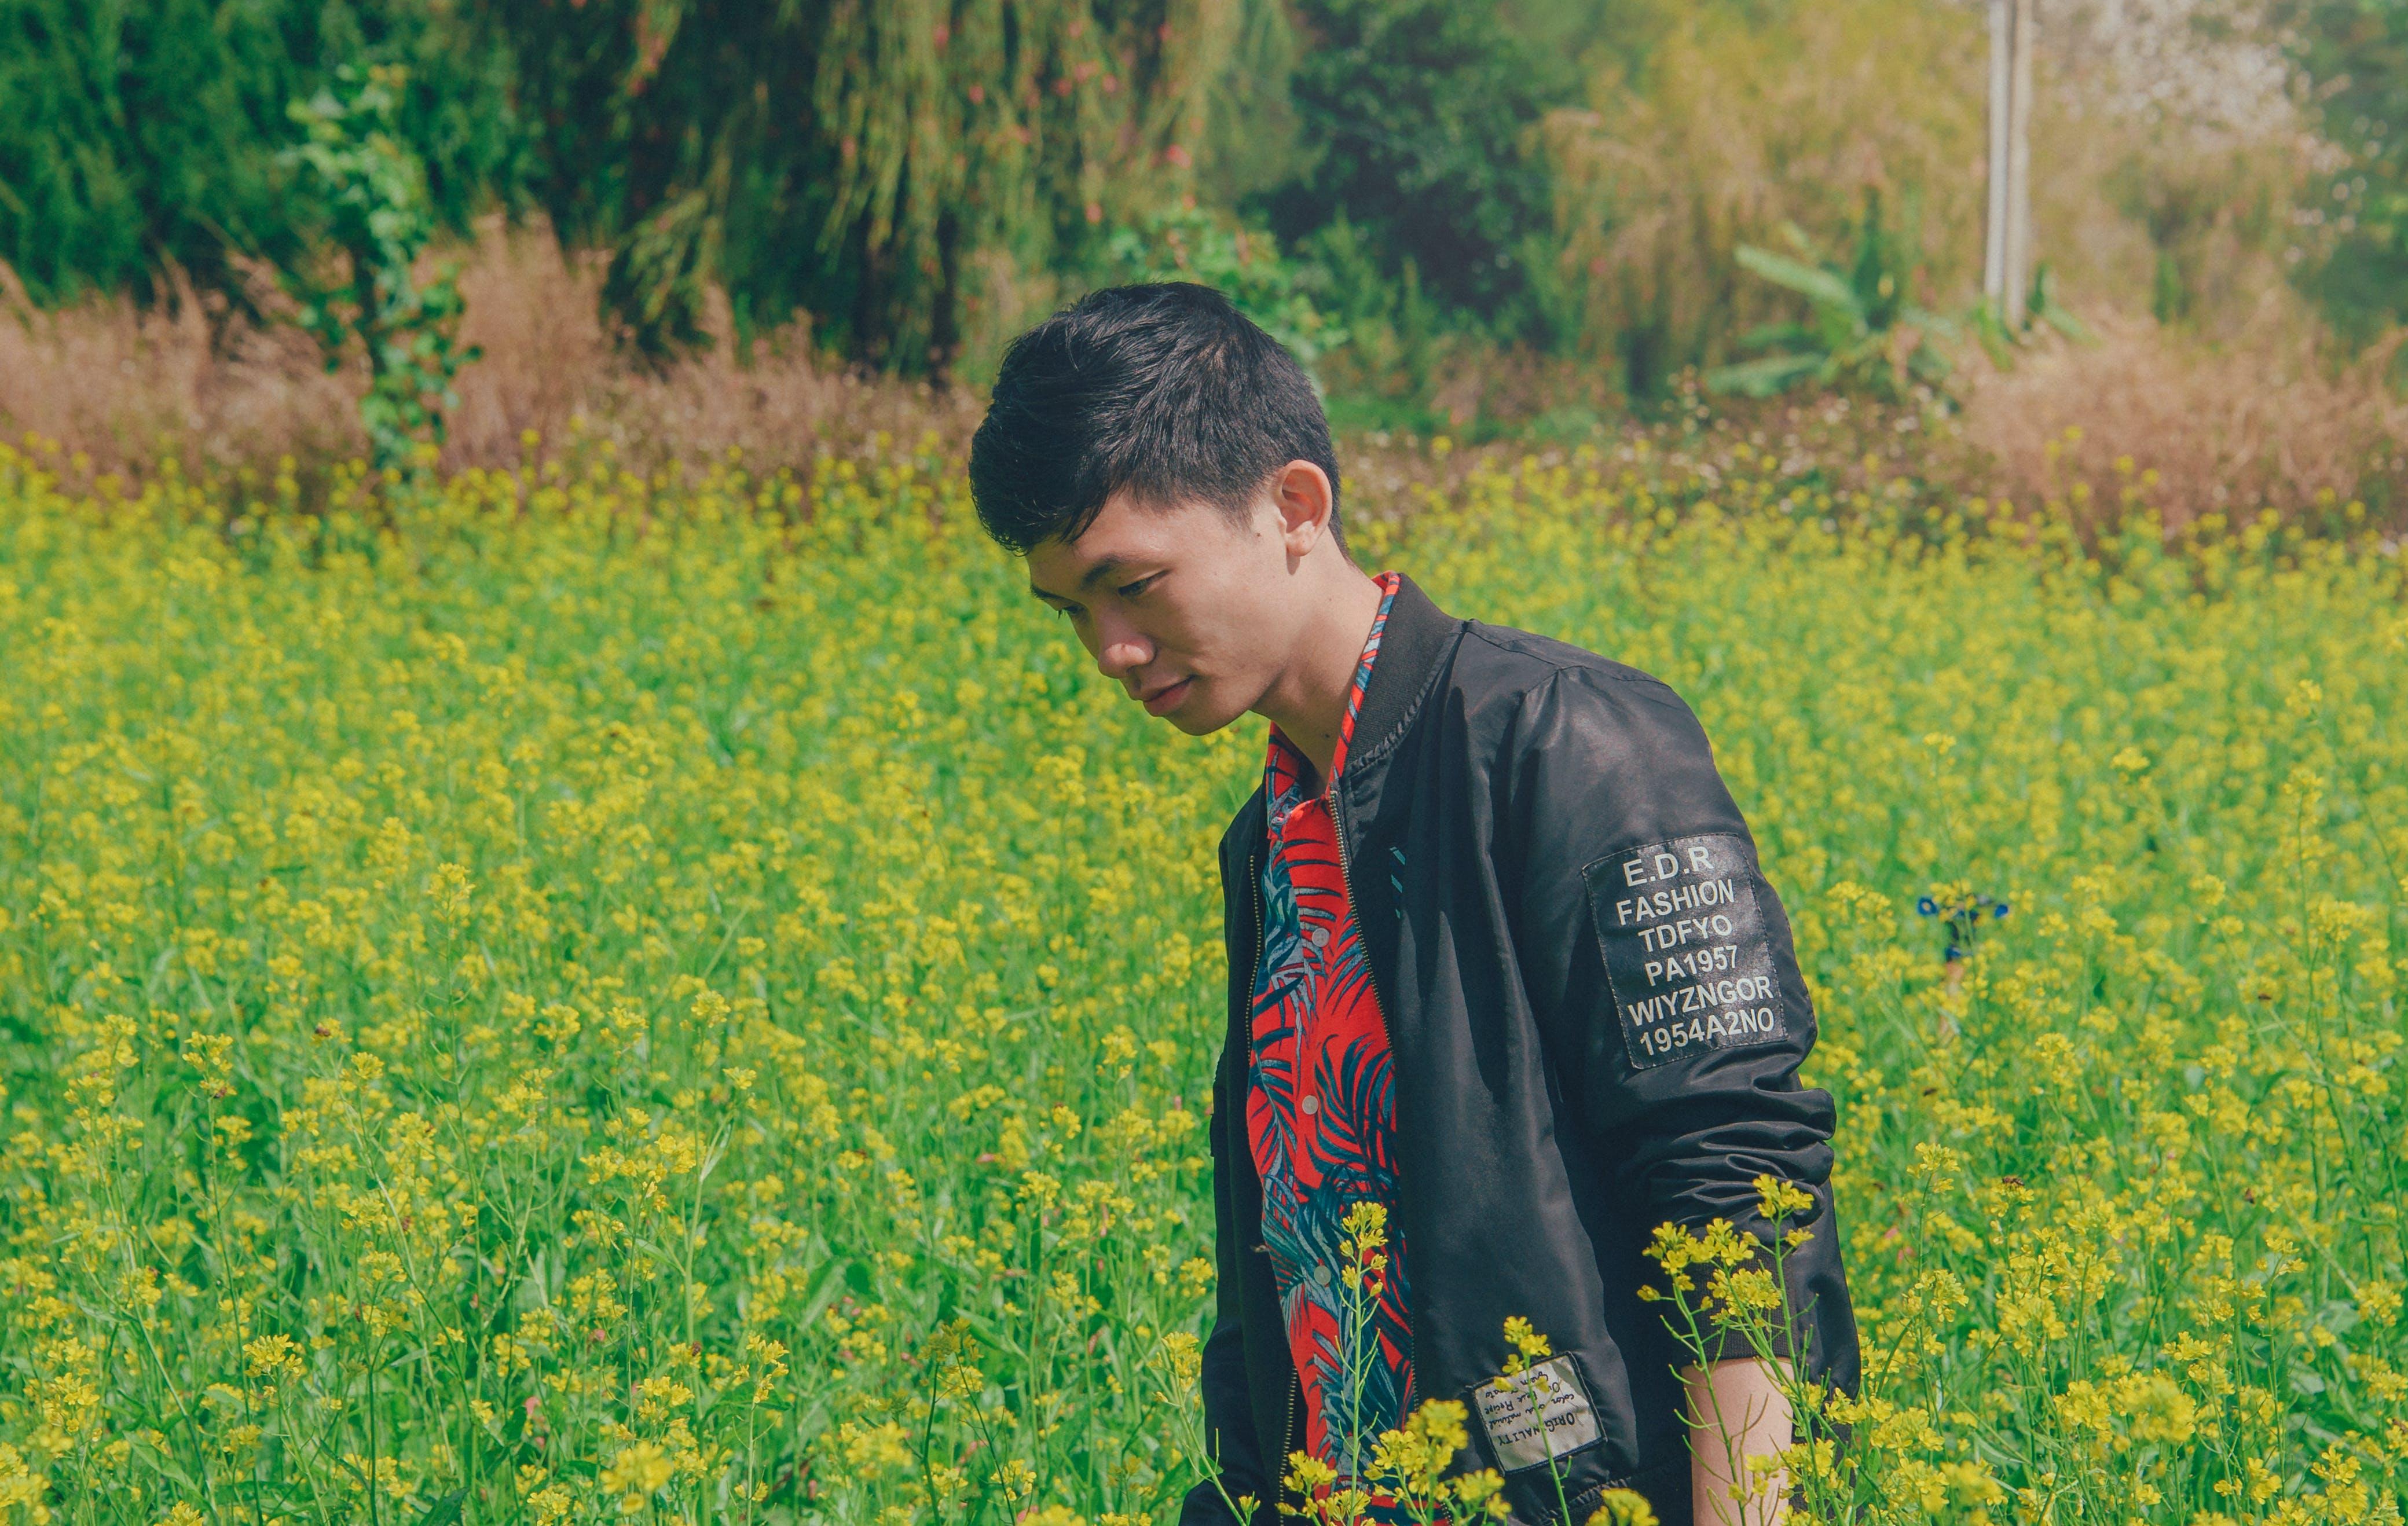 Man Wearing Black Jacket on Yellow Flowers